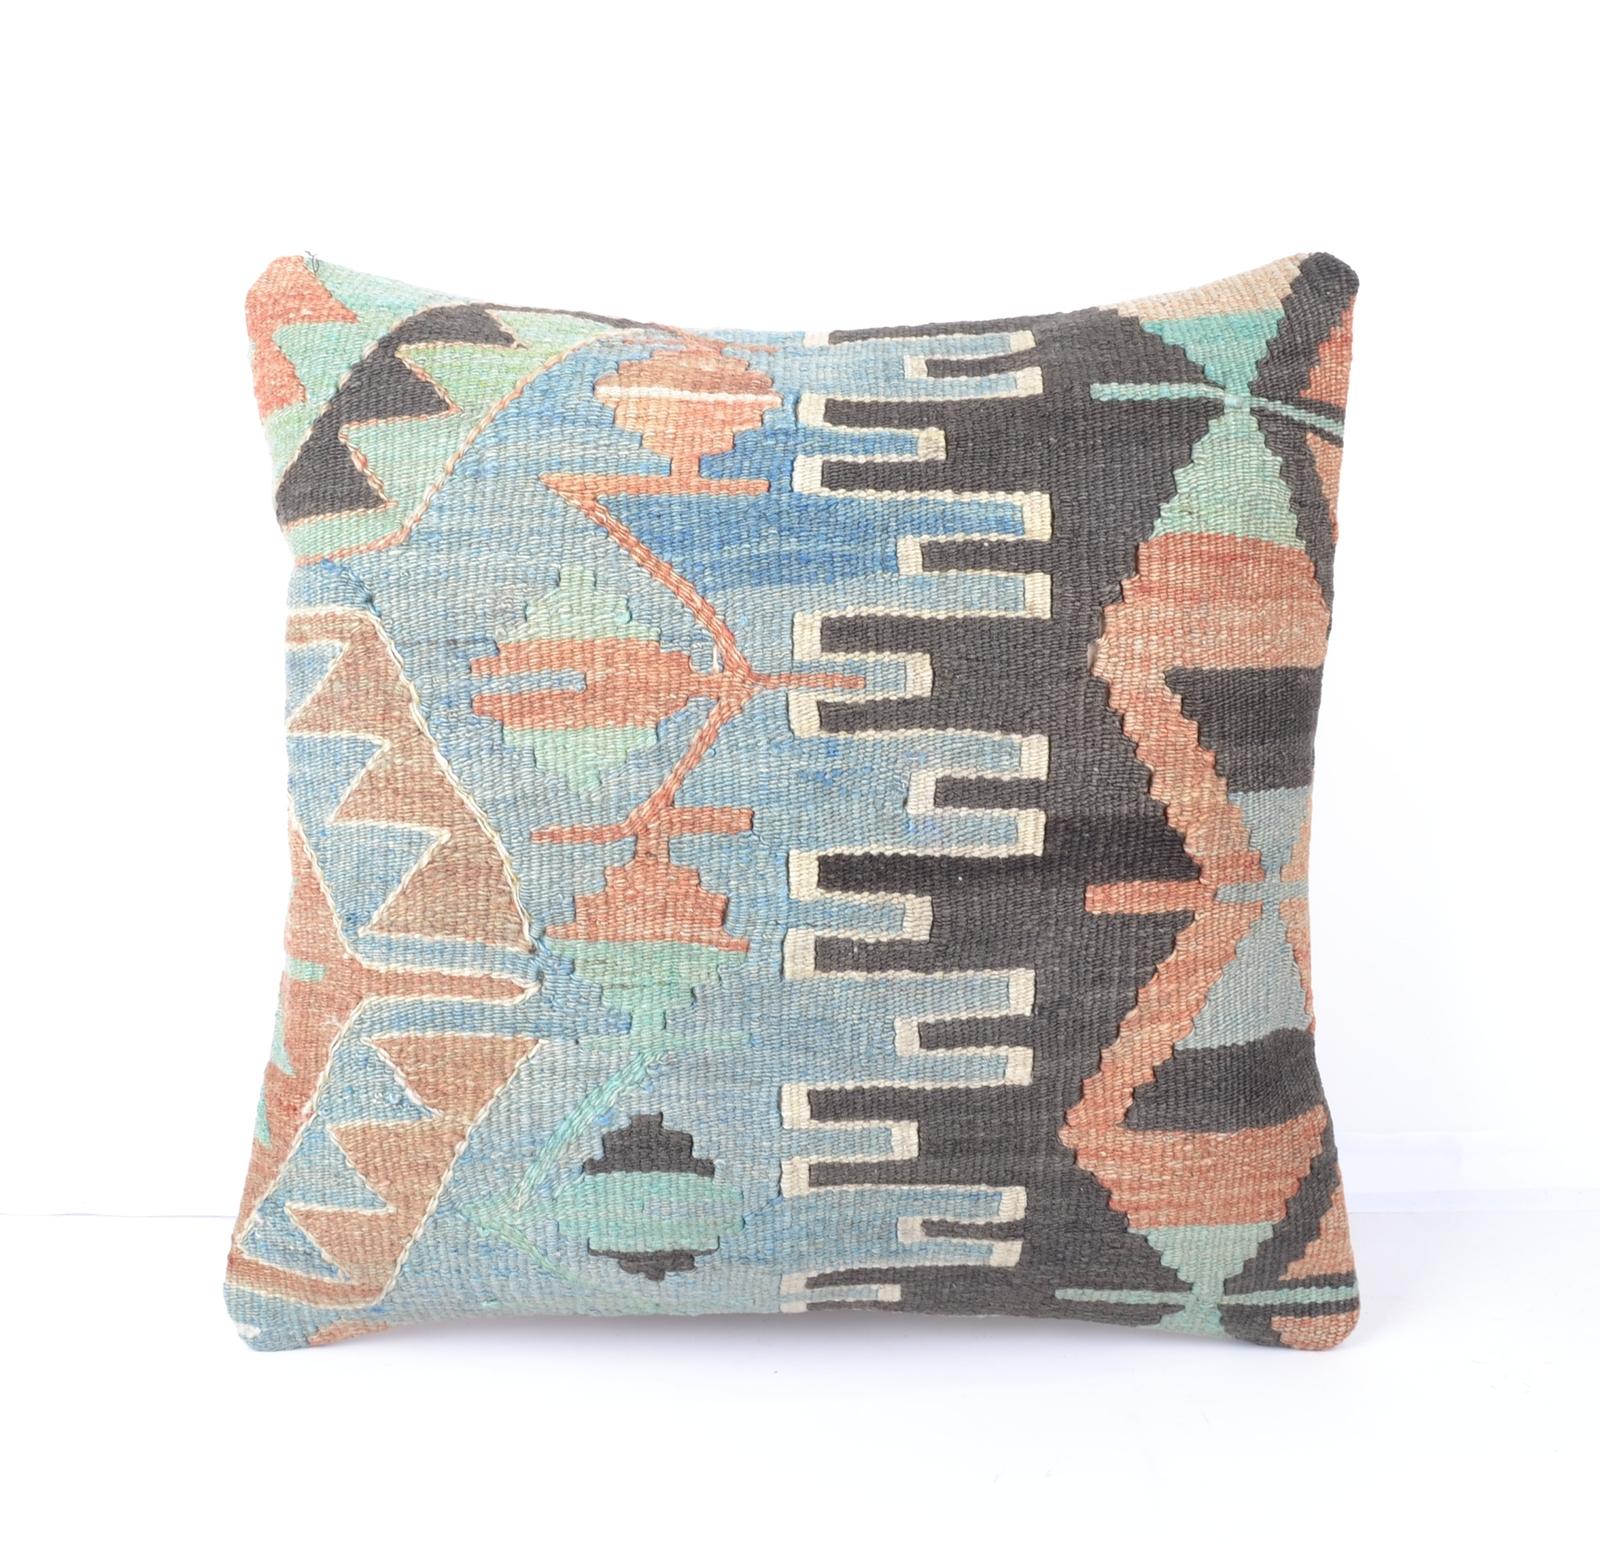 contemporary carpet,pillow cover throw,pastel blue pillow,balack bulue pillow - Pillows